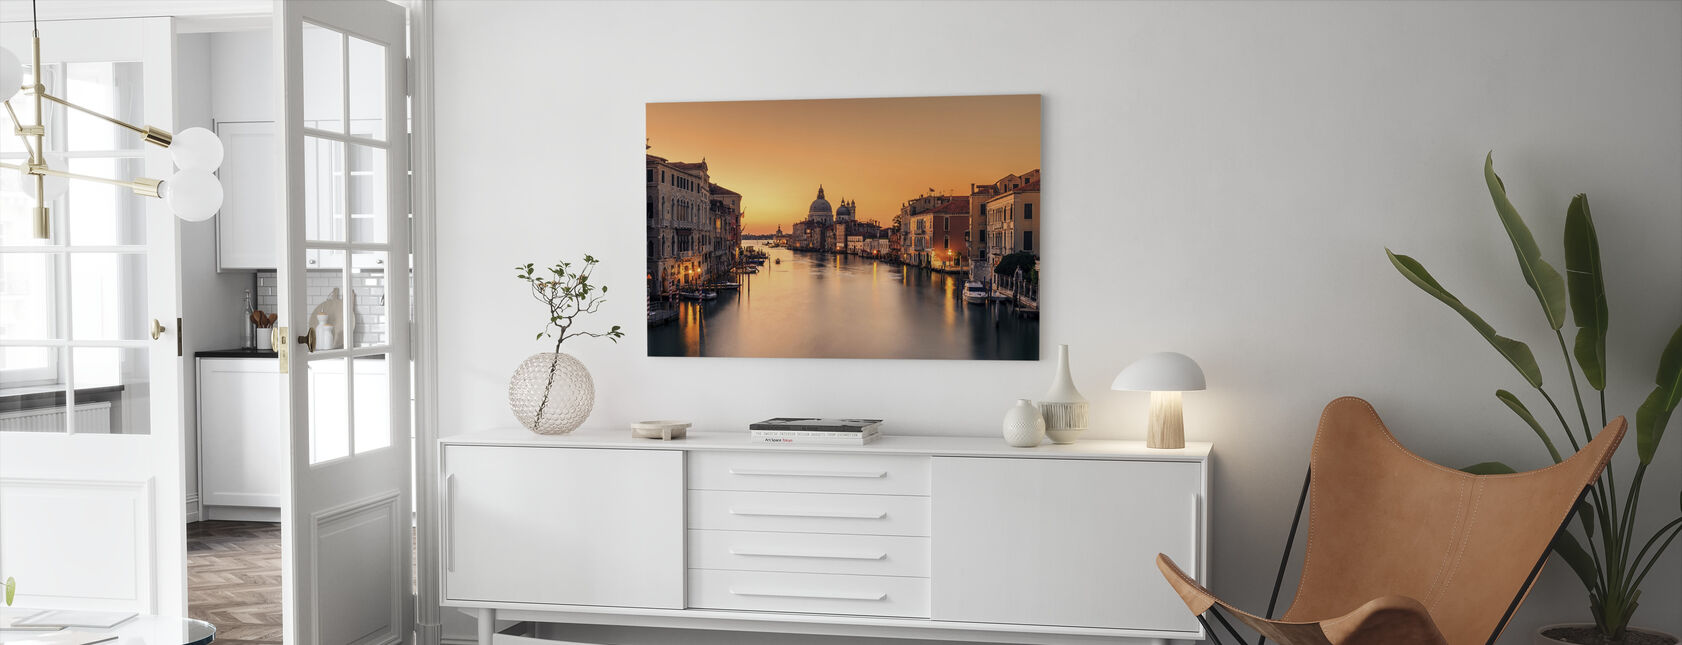 Daggry på Venezia - Lerretsbilde - Stue